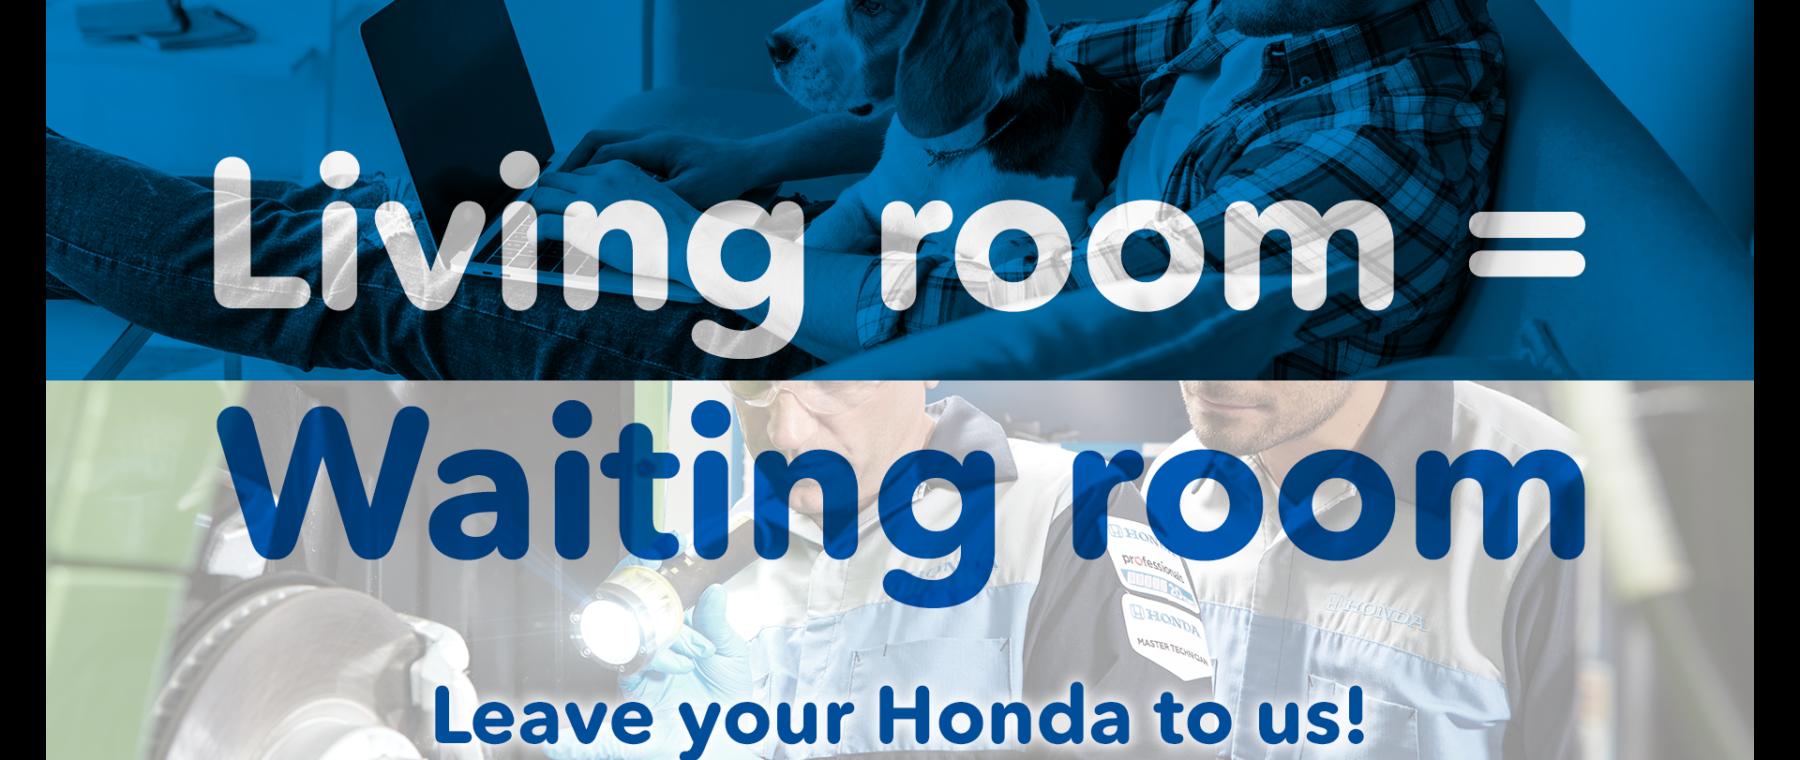 Honda Service Valet